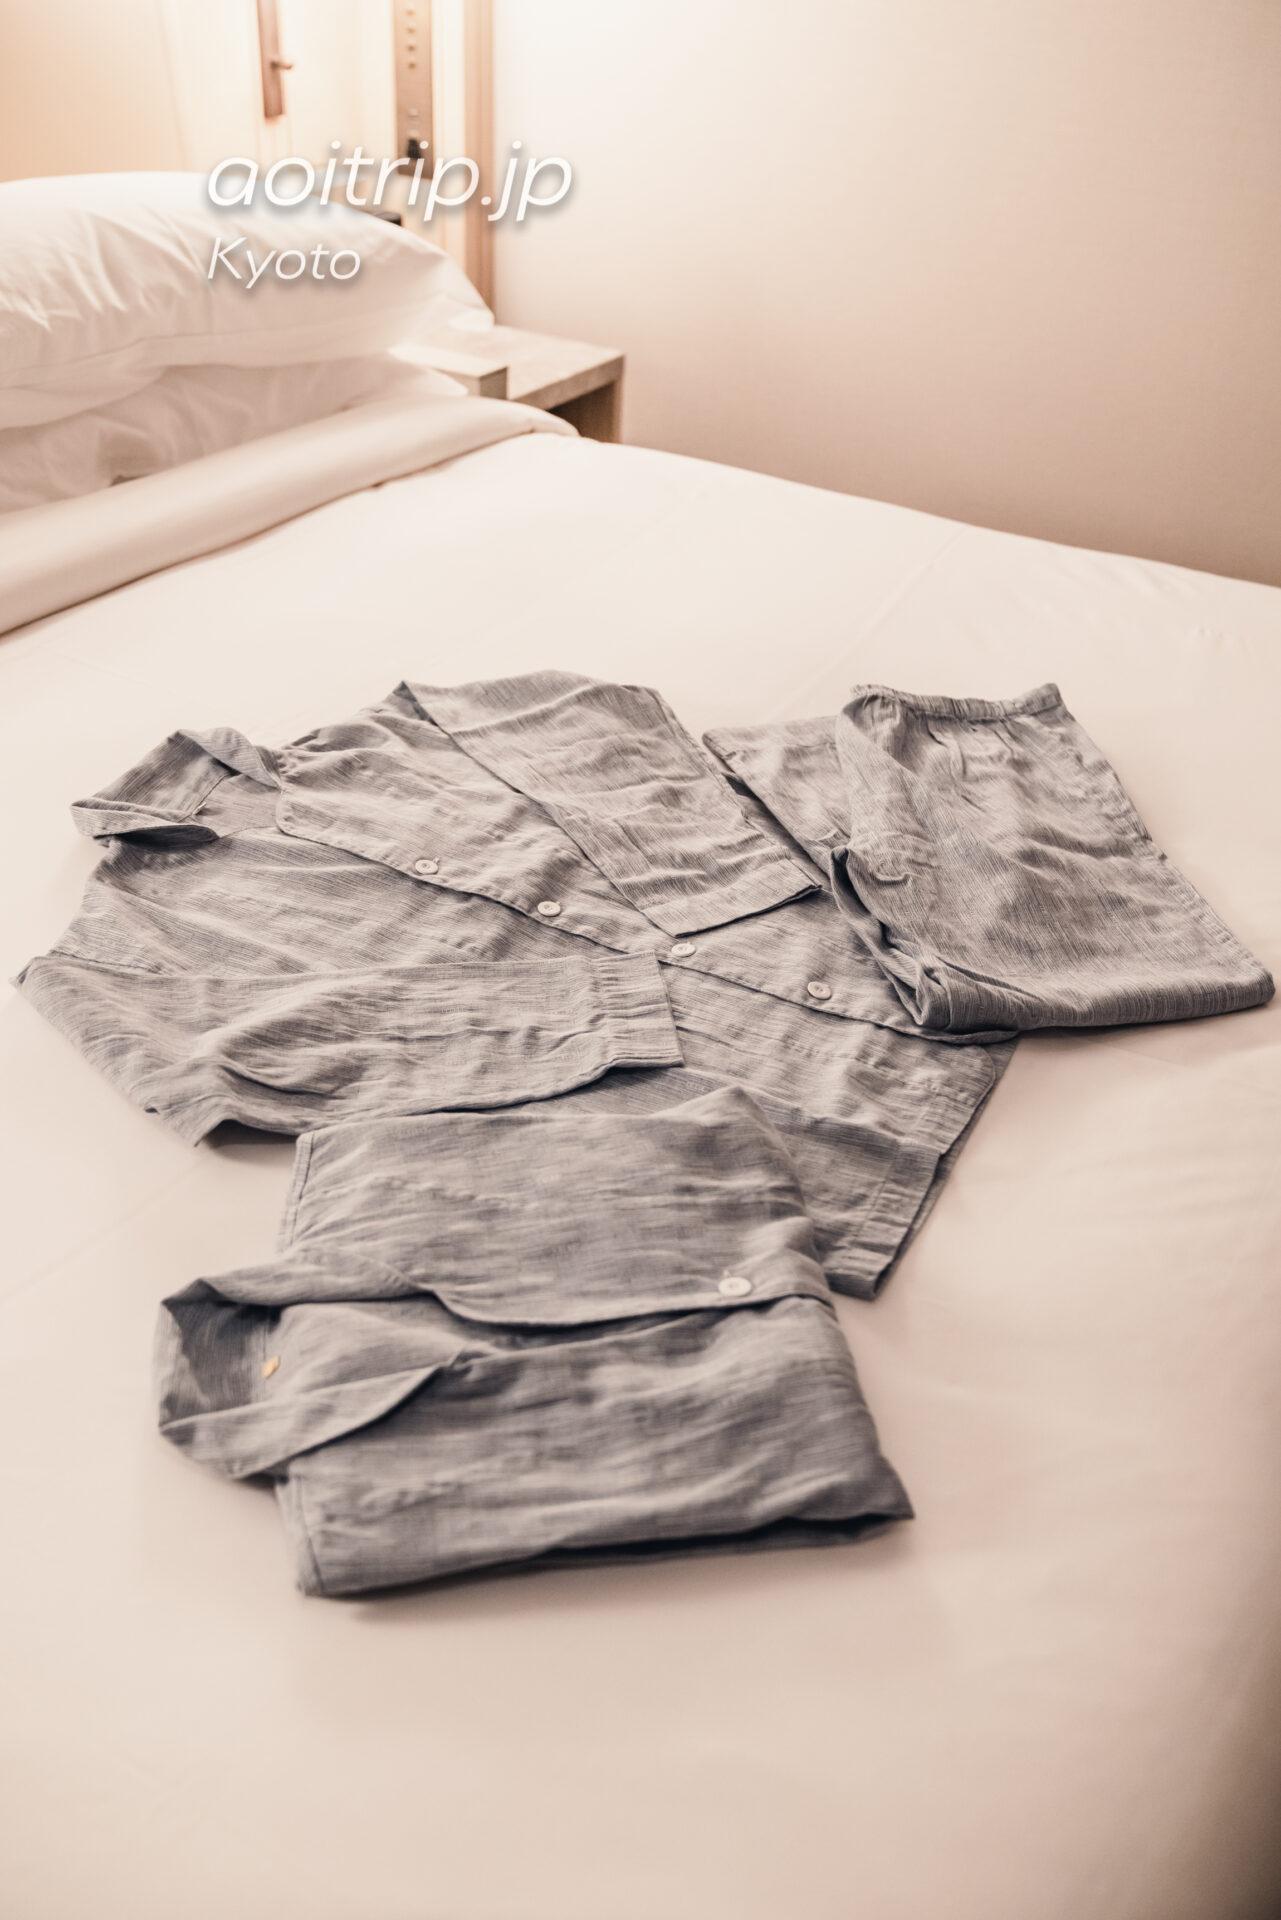 HOTEL THE MITSUI KYOTO デラックススイートのパジャマ(ルームウェア)